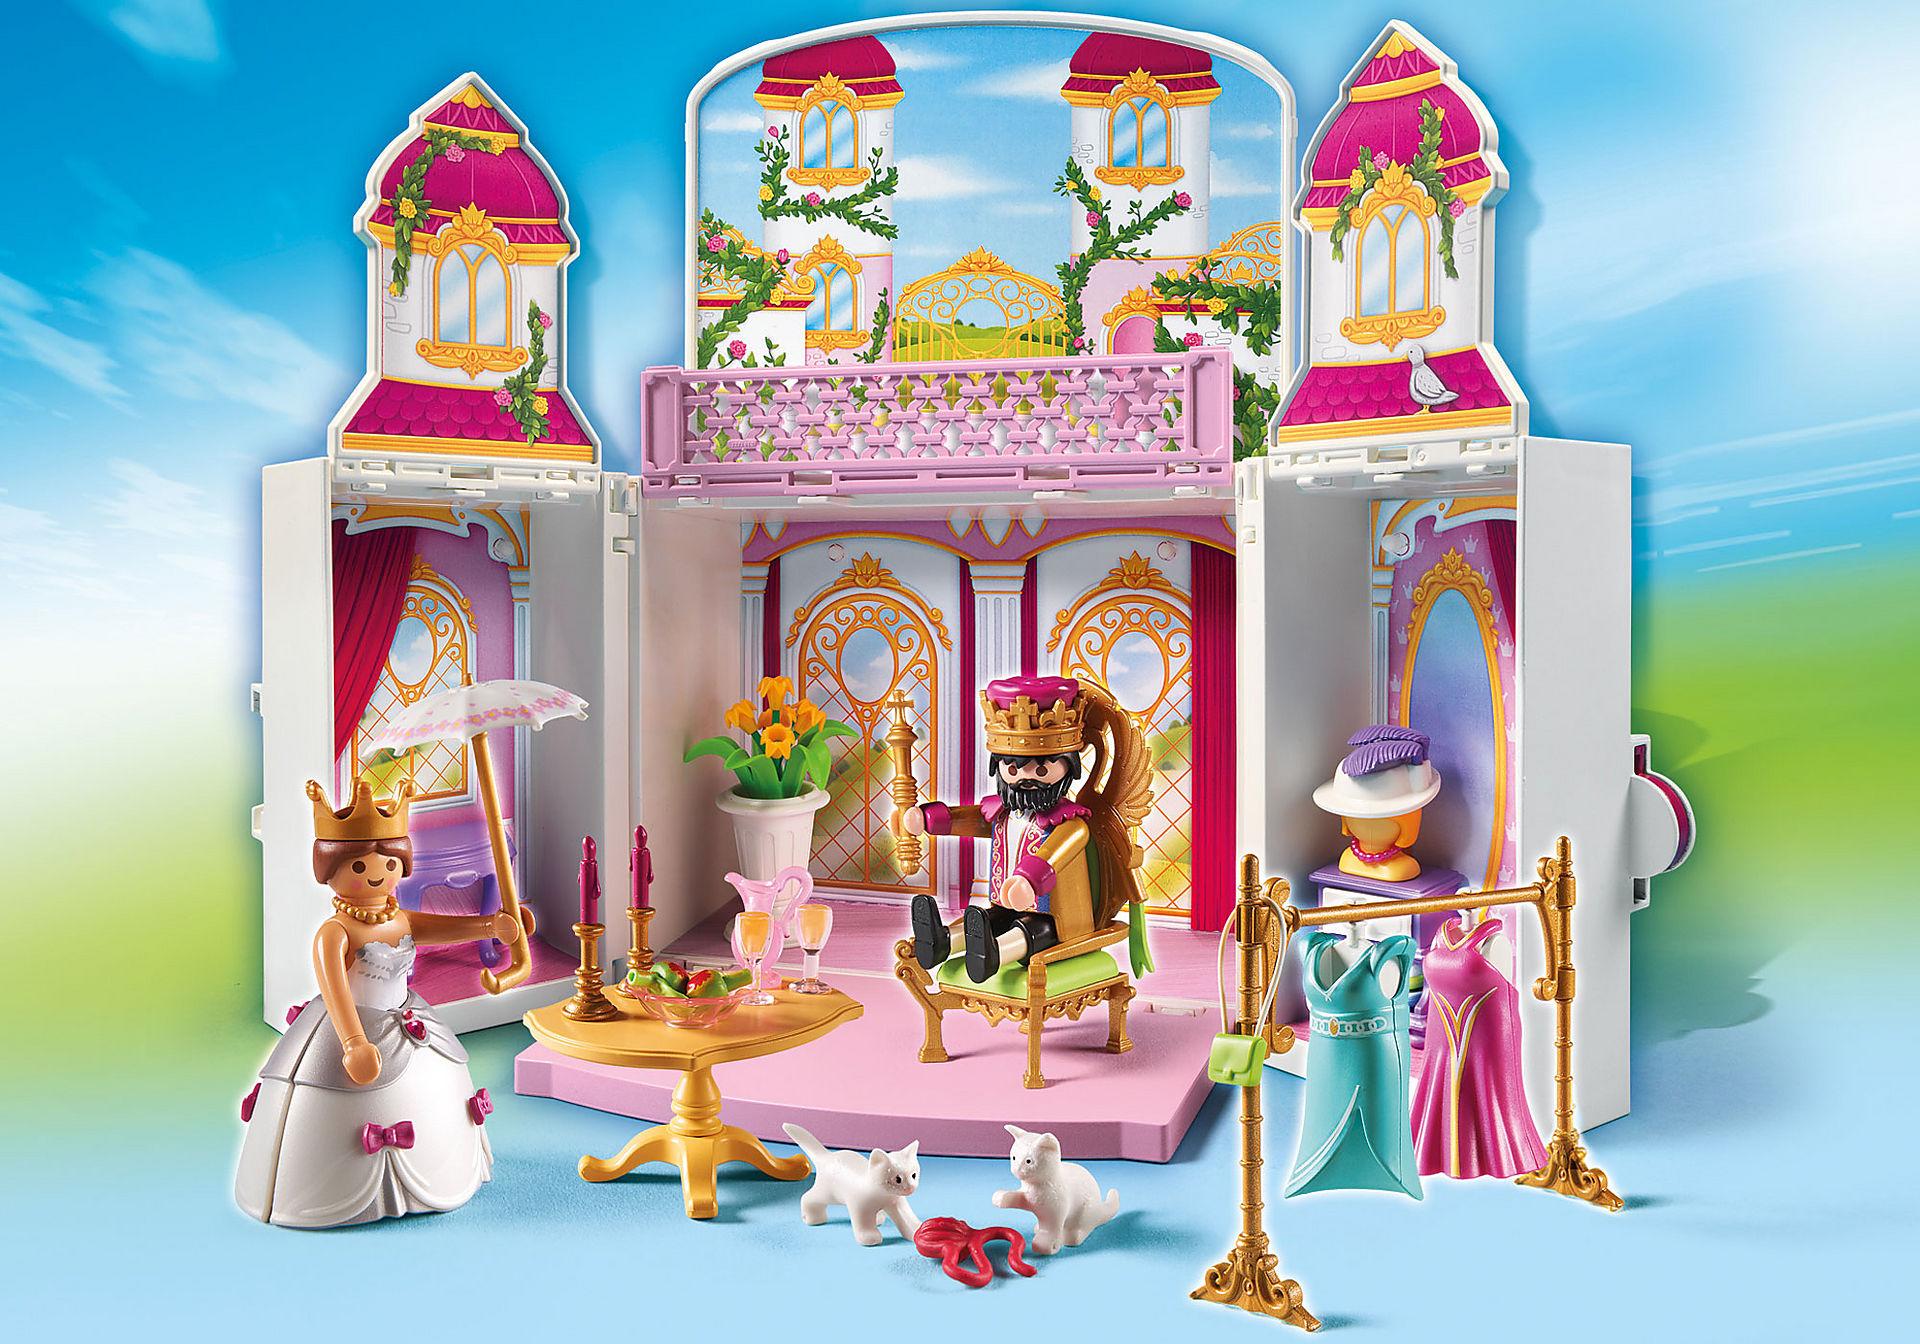 http://media.playmobil.com/i/playmobil/4898_product_detail/My Secret Royal Palace Play Box